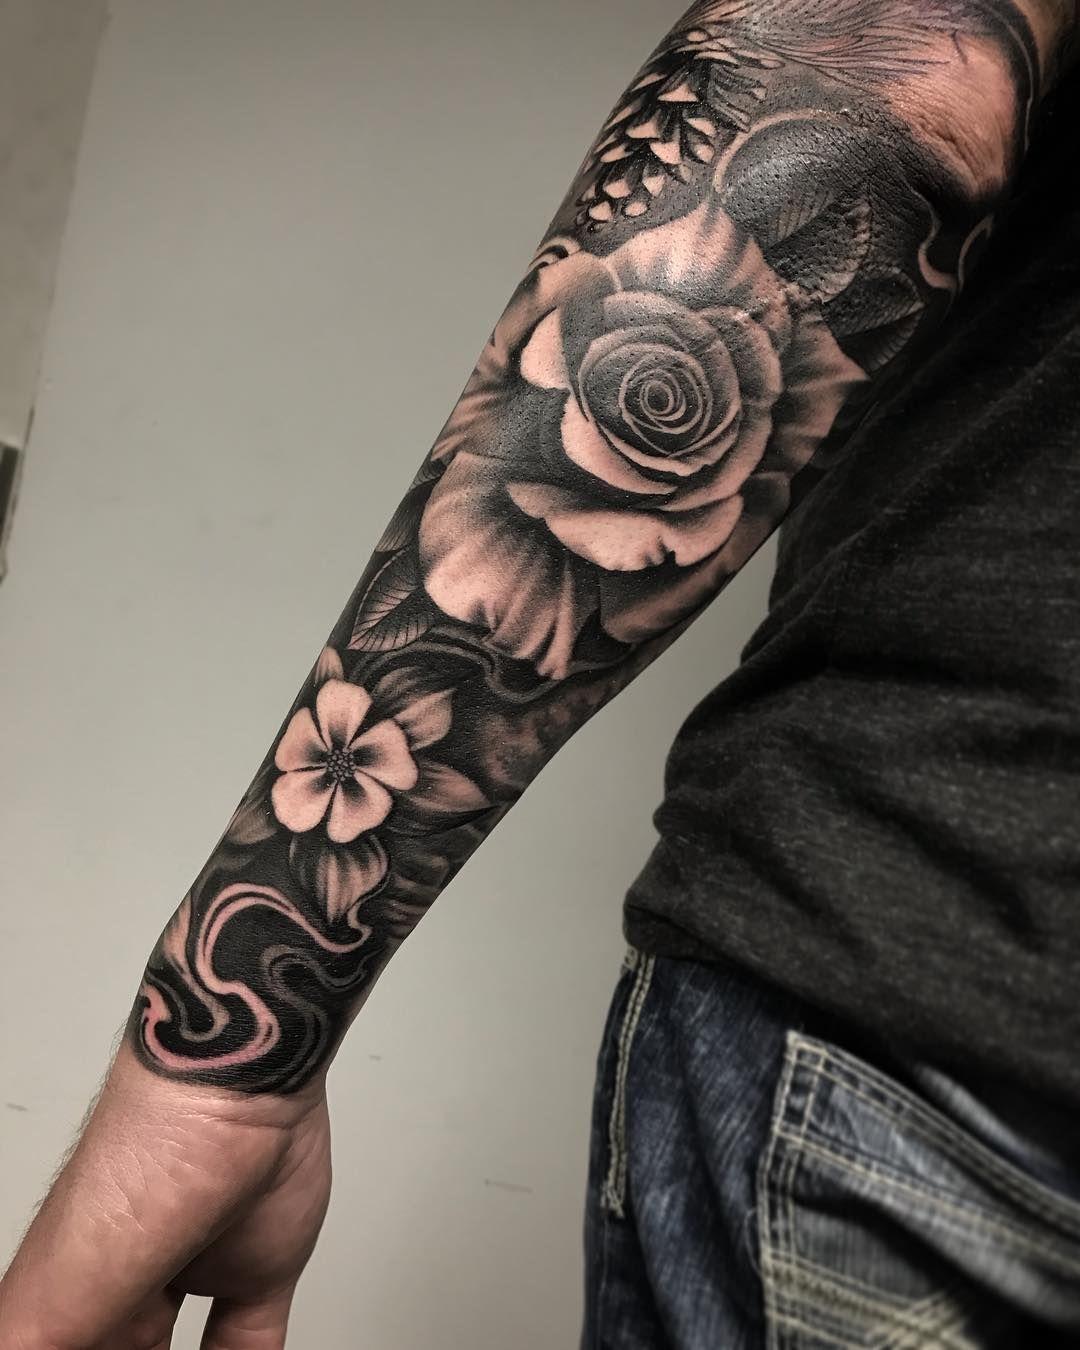 Masculine Flower Tattoo : masculine, flower, tattoo, Floral, Tattoos, Masculine, Fellas, Don't, Think, Roses, Ladies., Artis, Tattoo, Sleeve,, Flower, Tattoo,